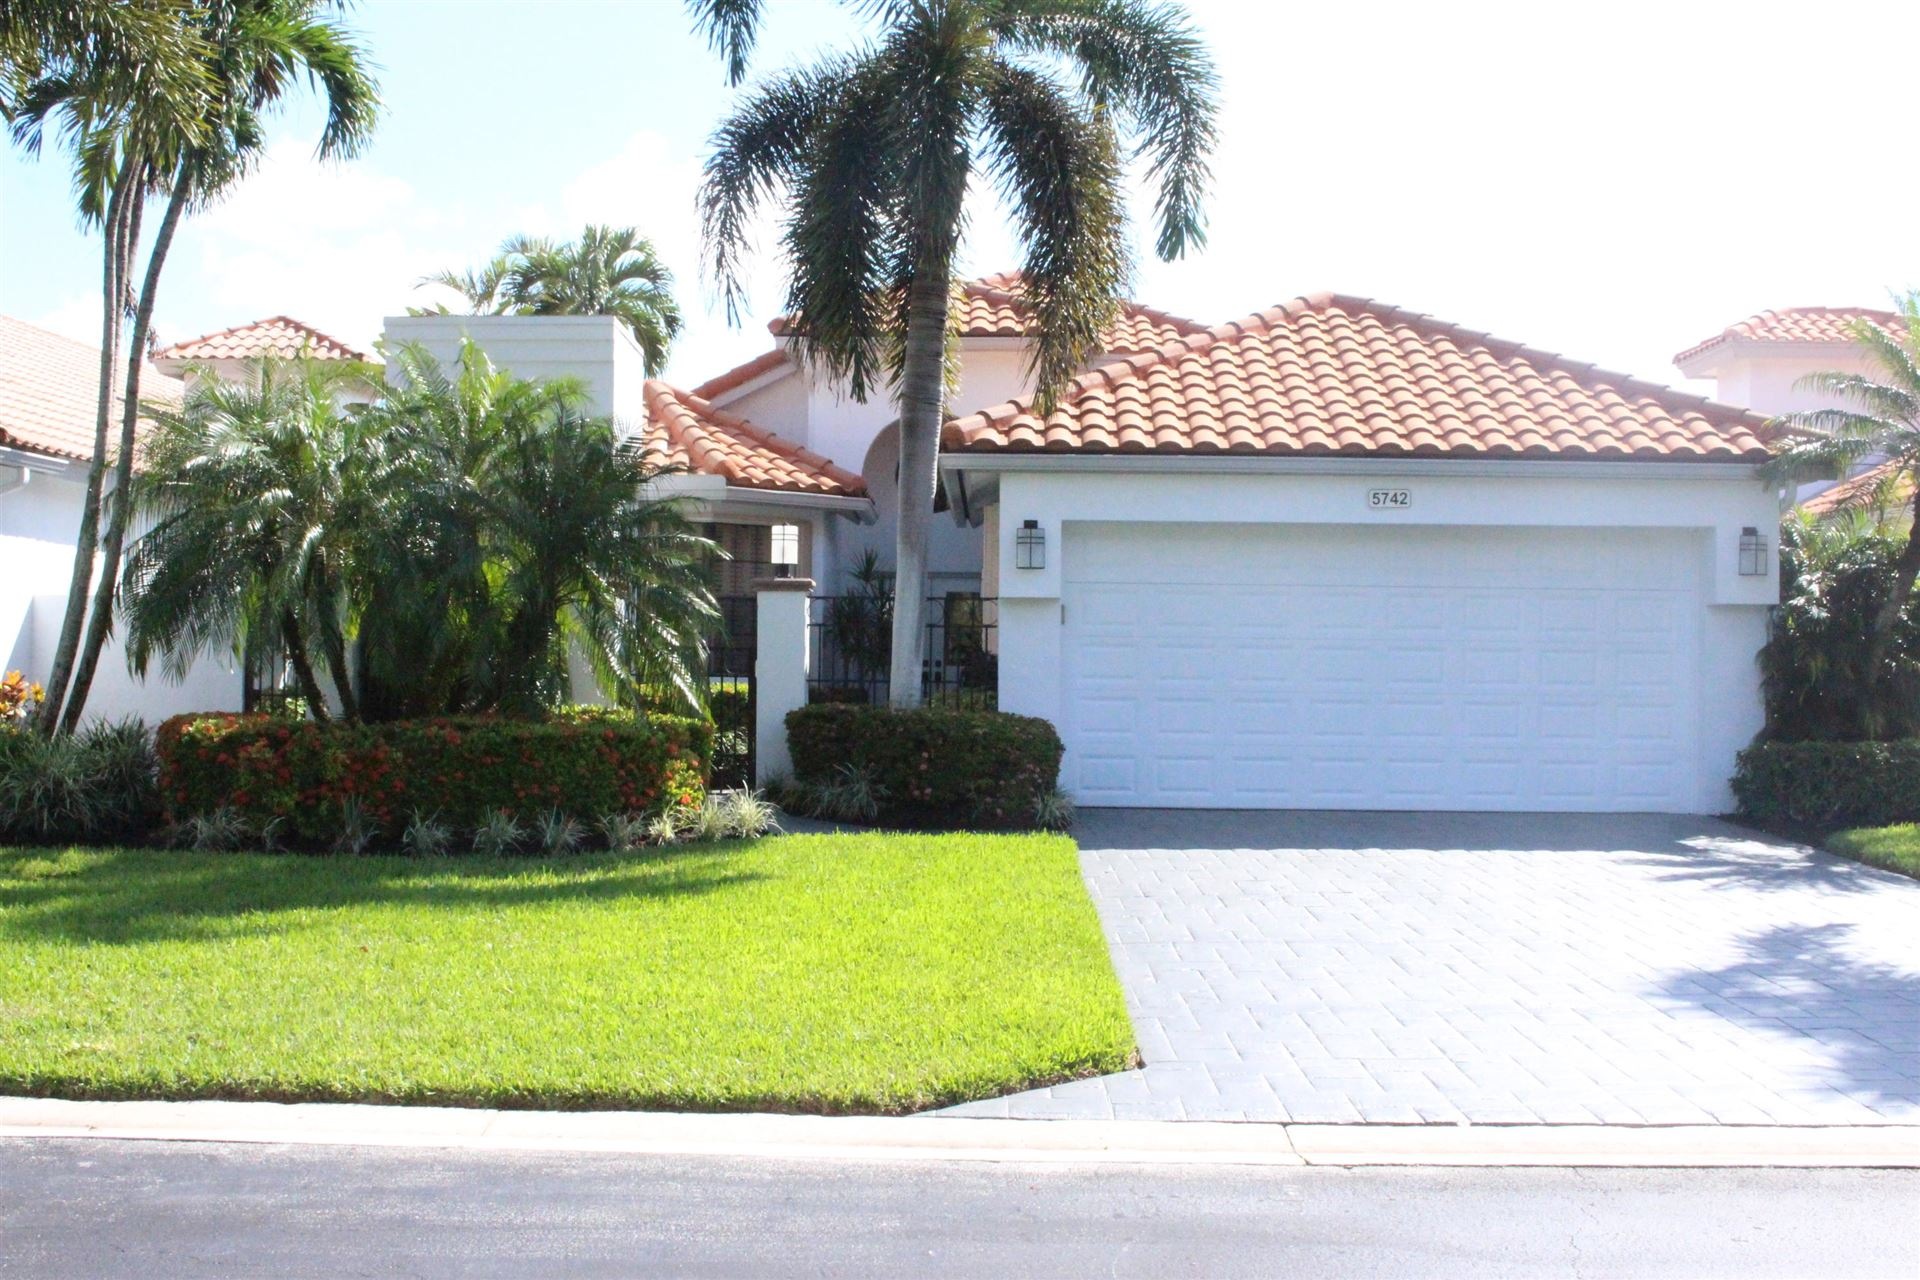 5742 NW 21st Avenue, Boca Raton, FL 33496 - #: RX-10572659